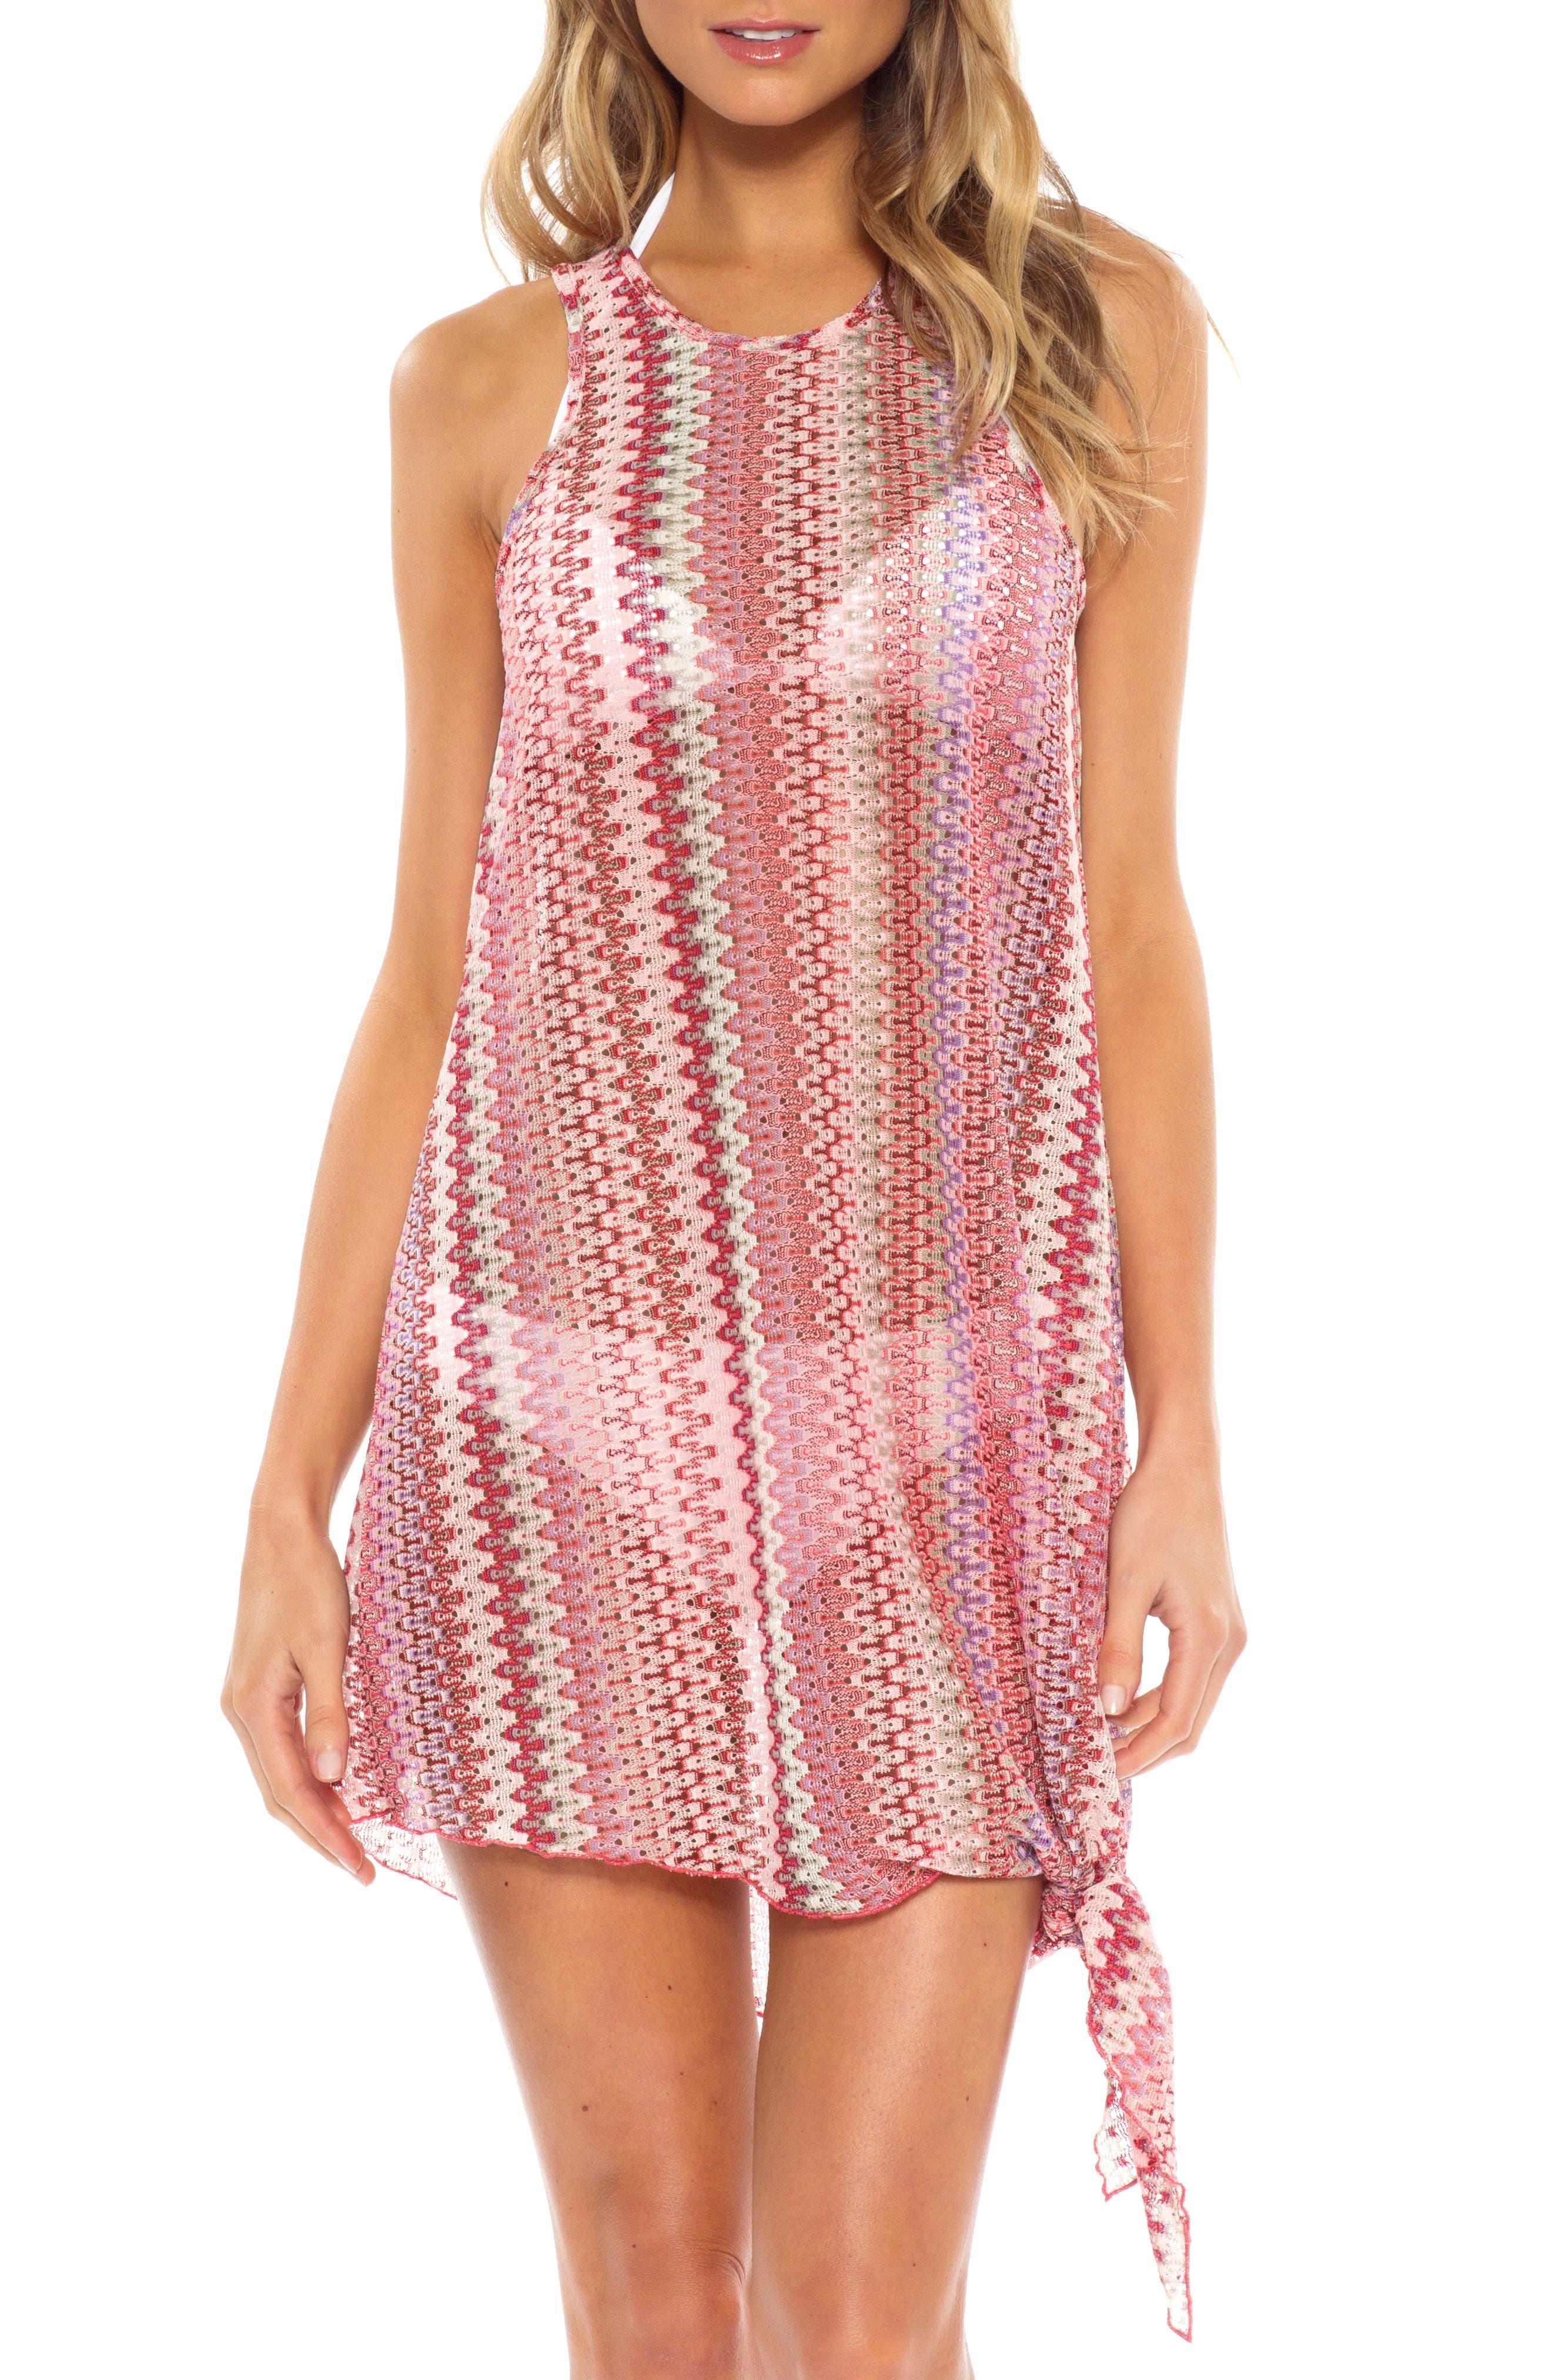 Becca Pierside Knot Cover-Up Dress, Pink